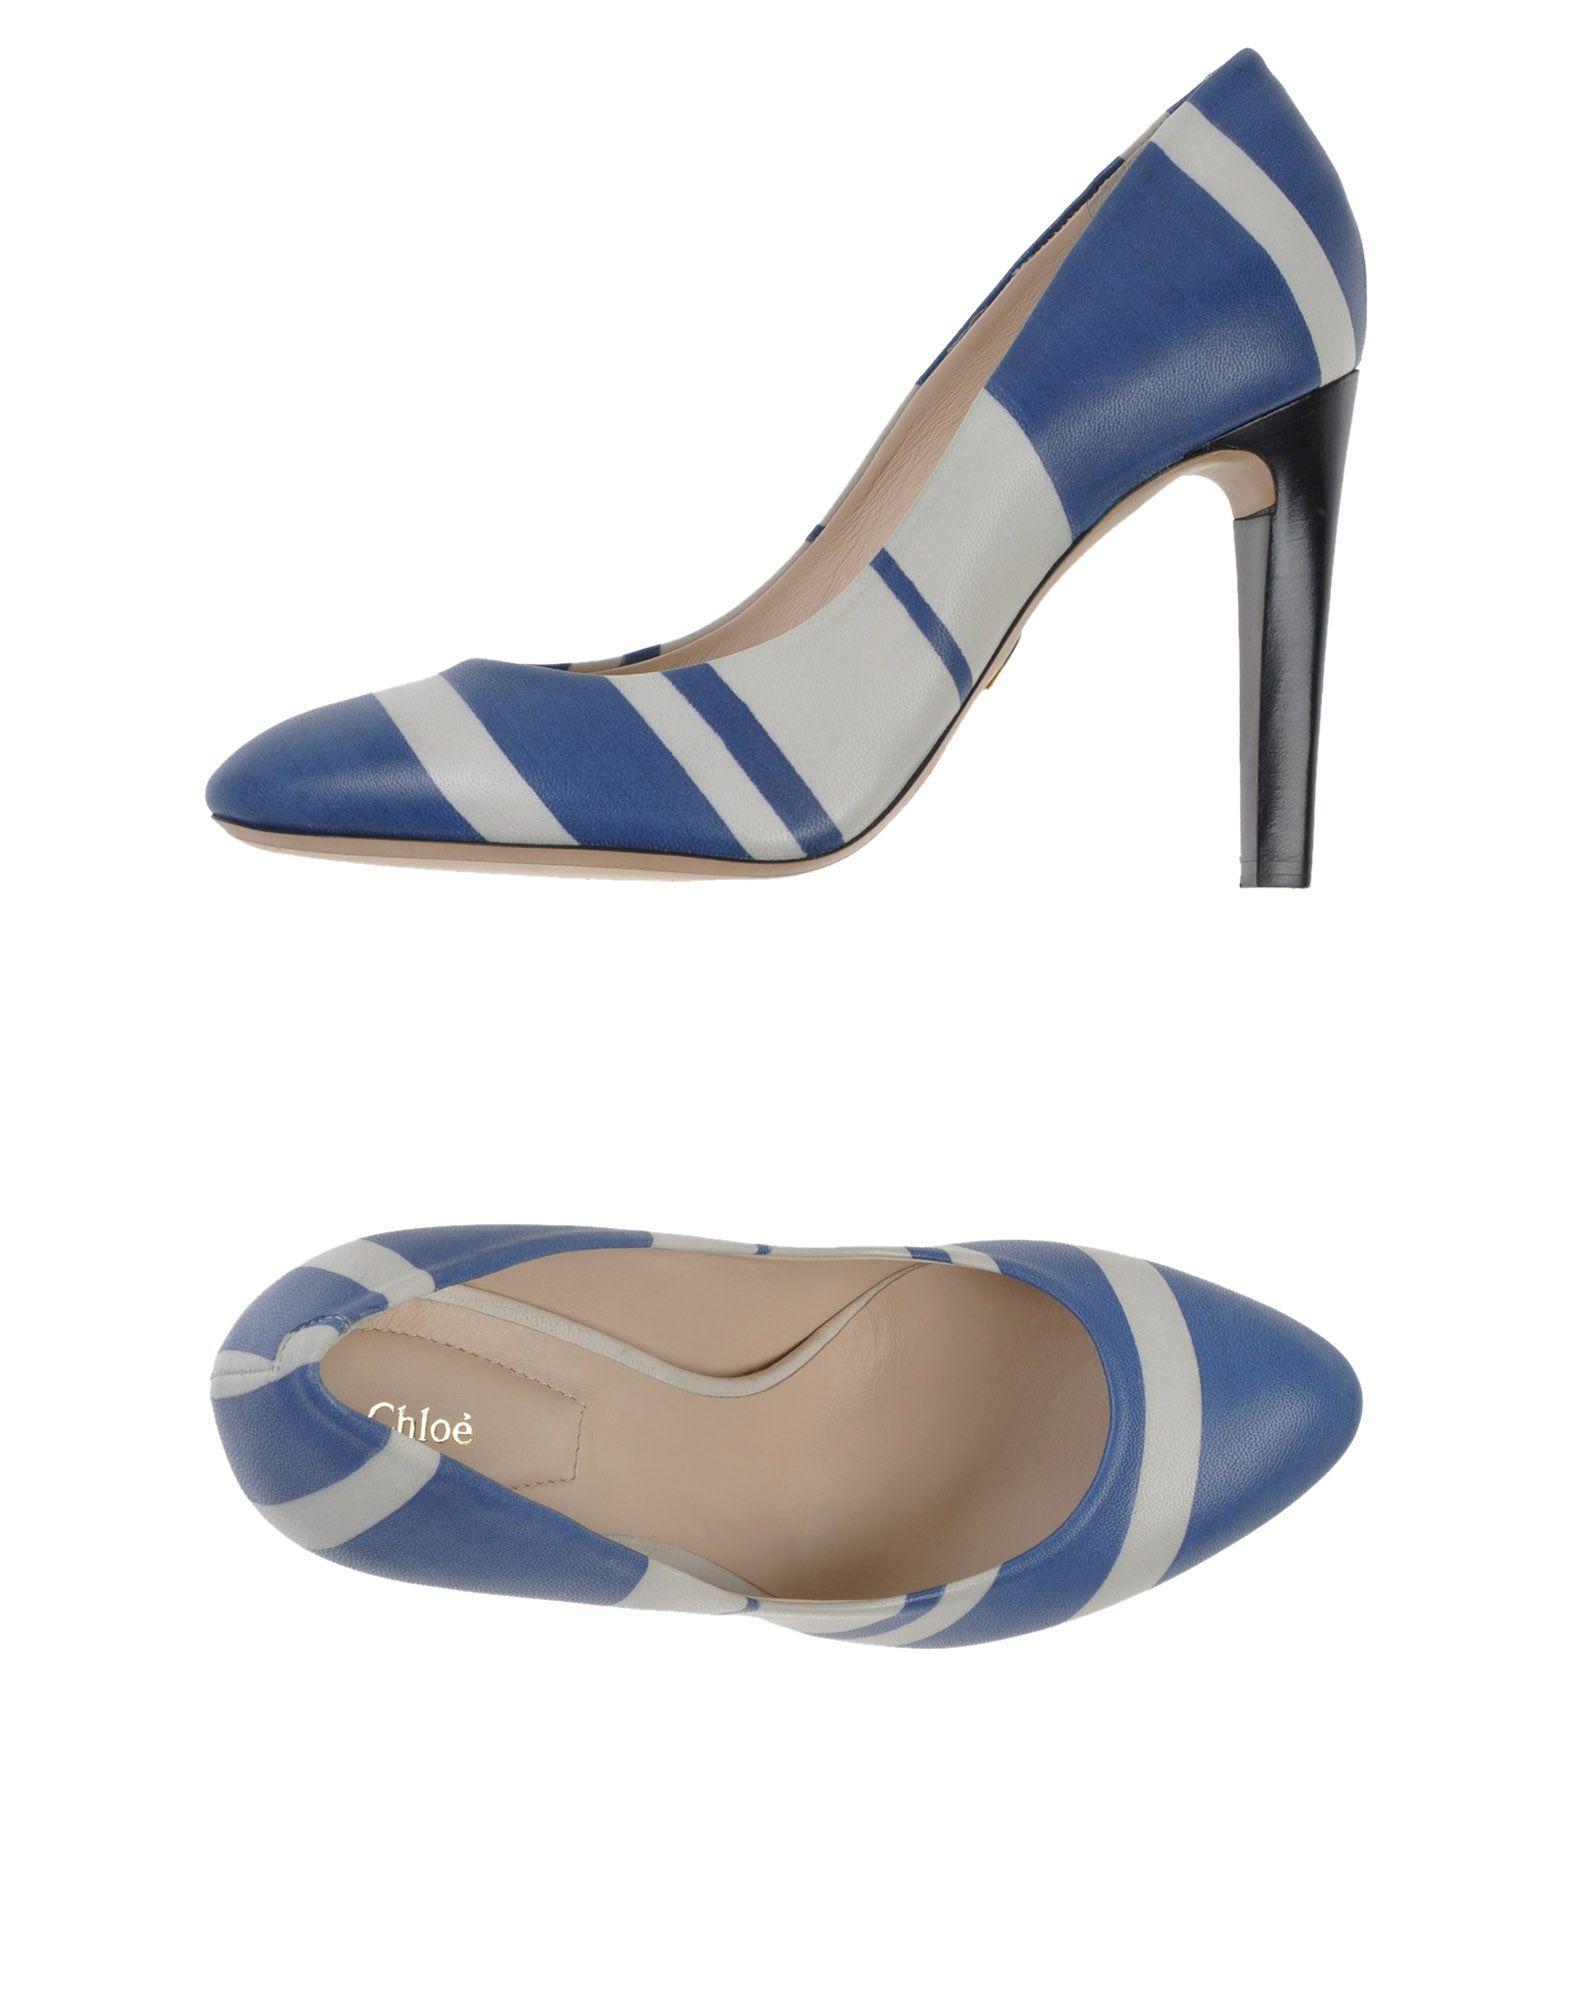 Rabatt  Schuhe Chloé Pumps Damen  Rabatt 44782269OT 9c3e4d